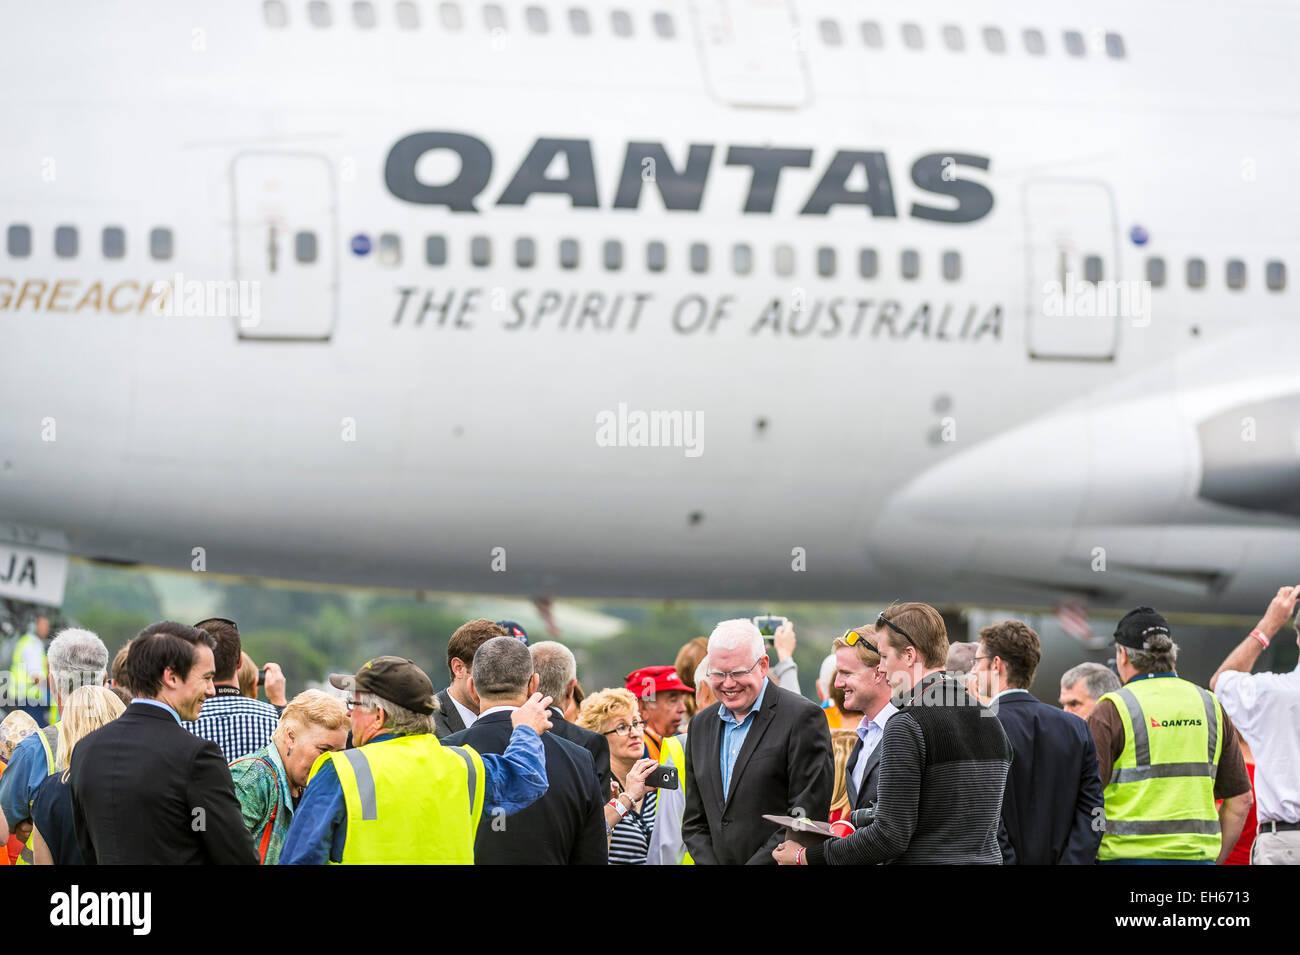 Sydney, Australie. 8 mars, 2015. Qantas a pris sa retraite de son premier Boeing 747-400, VH-oja, qui a volé Photo Stock